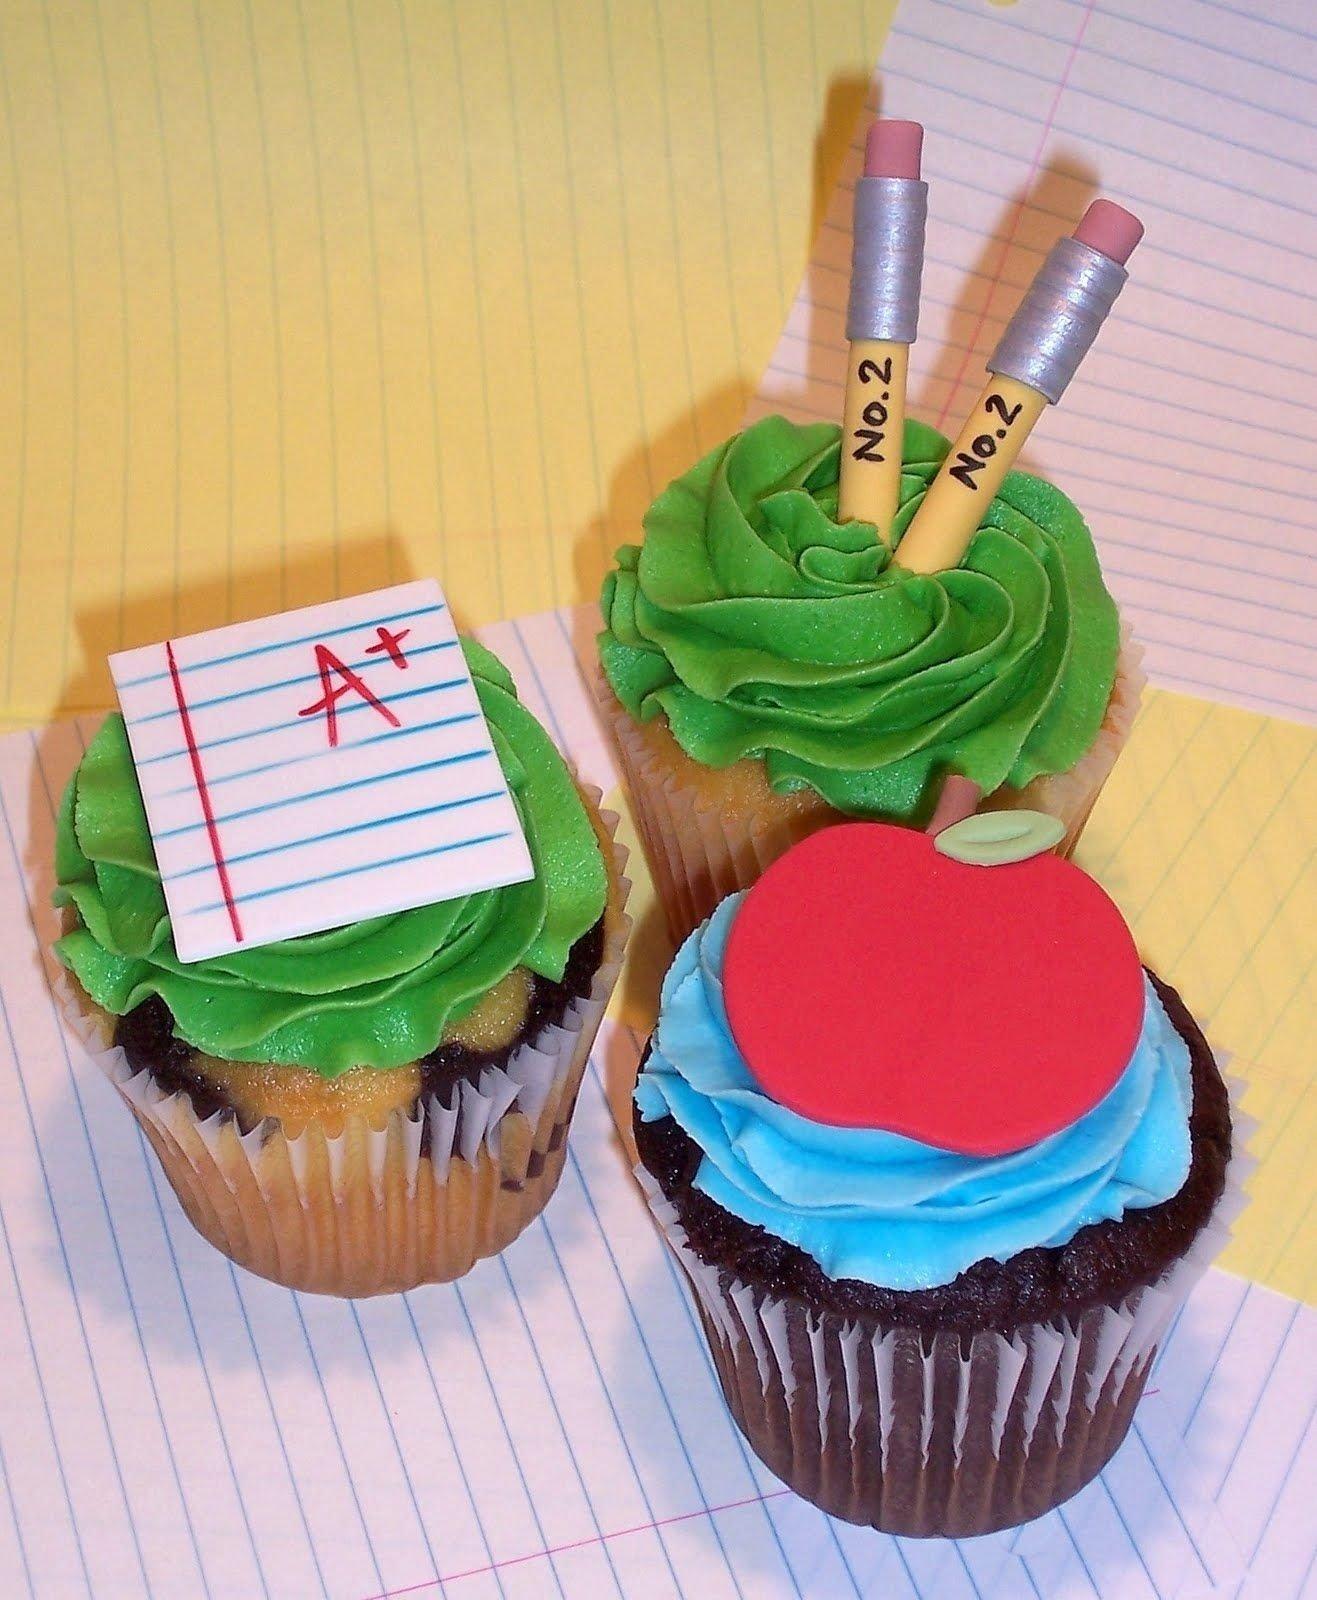 10 Lovely Back To School Cupcake Ideas teacher back to school cupcakes cakes pops cupcakes 2020